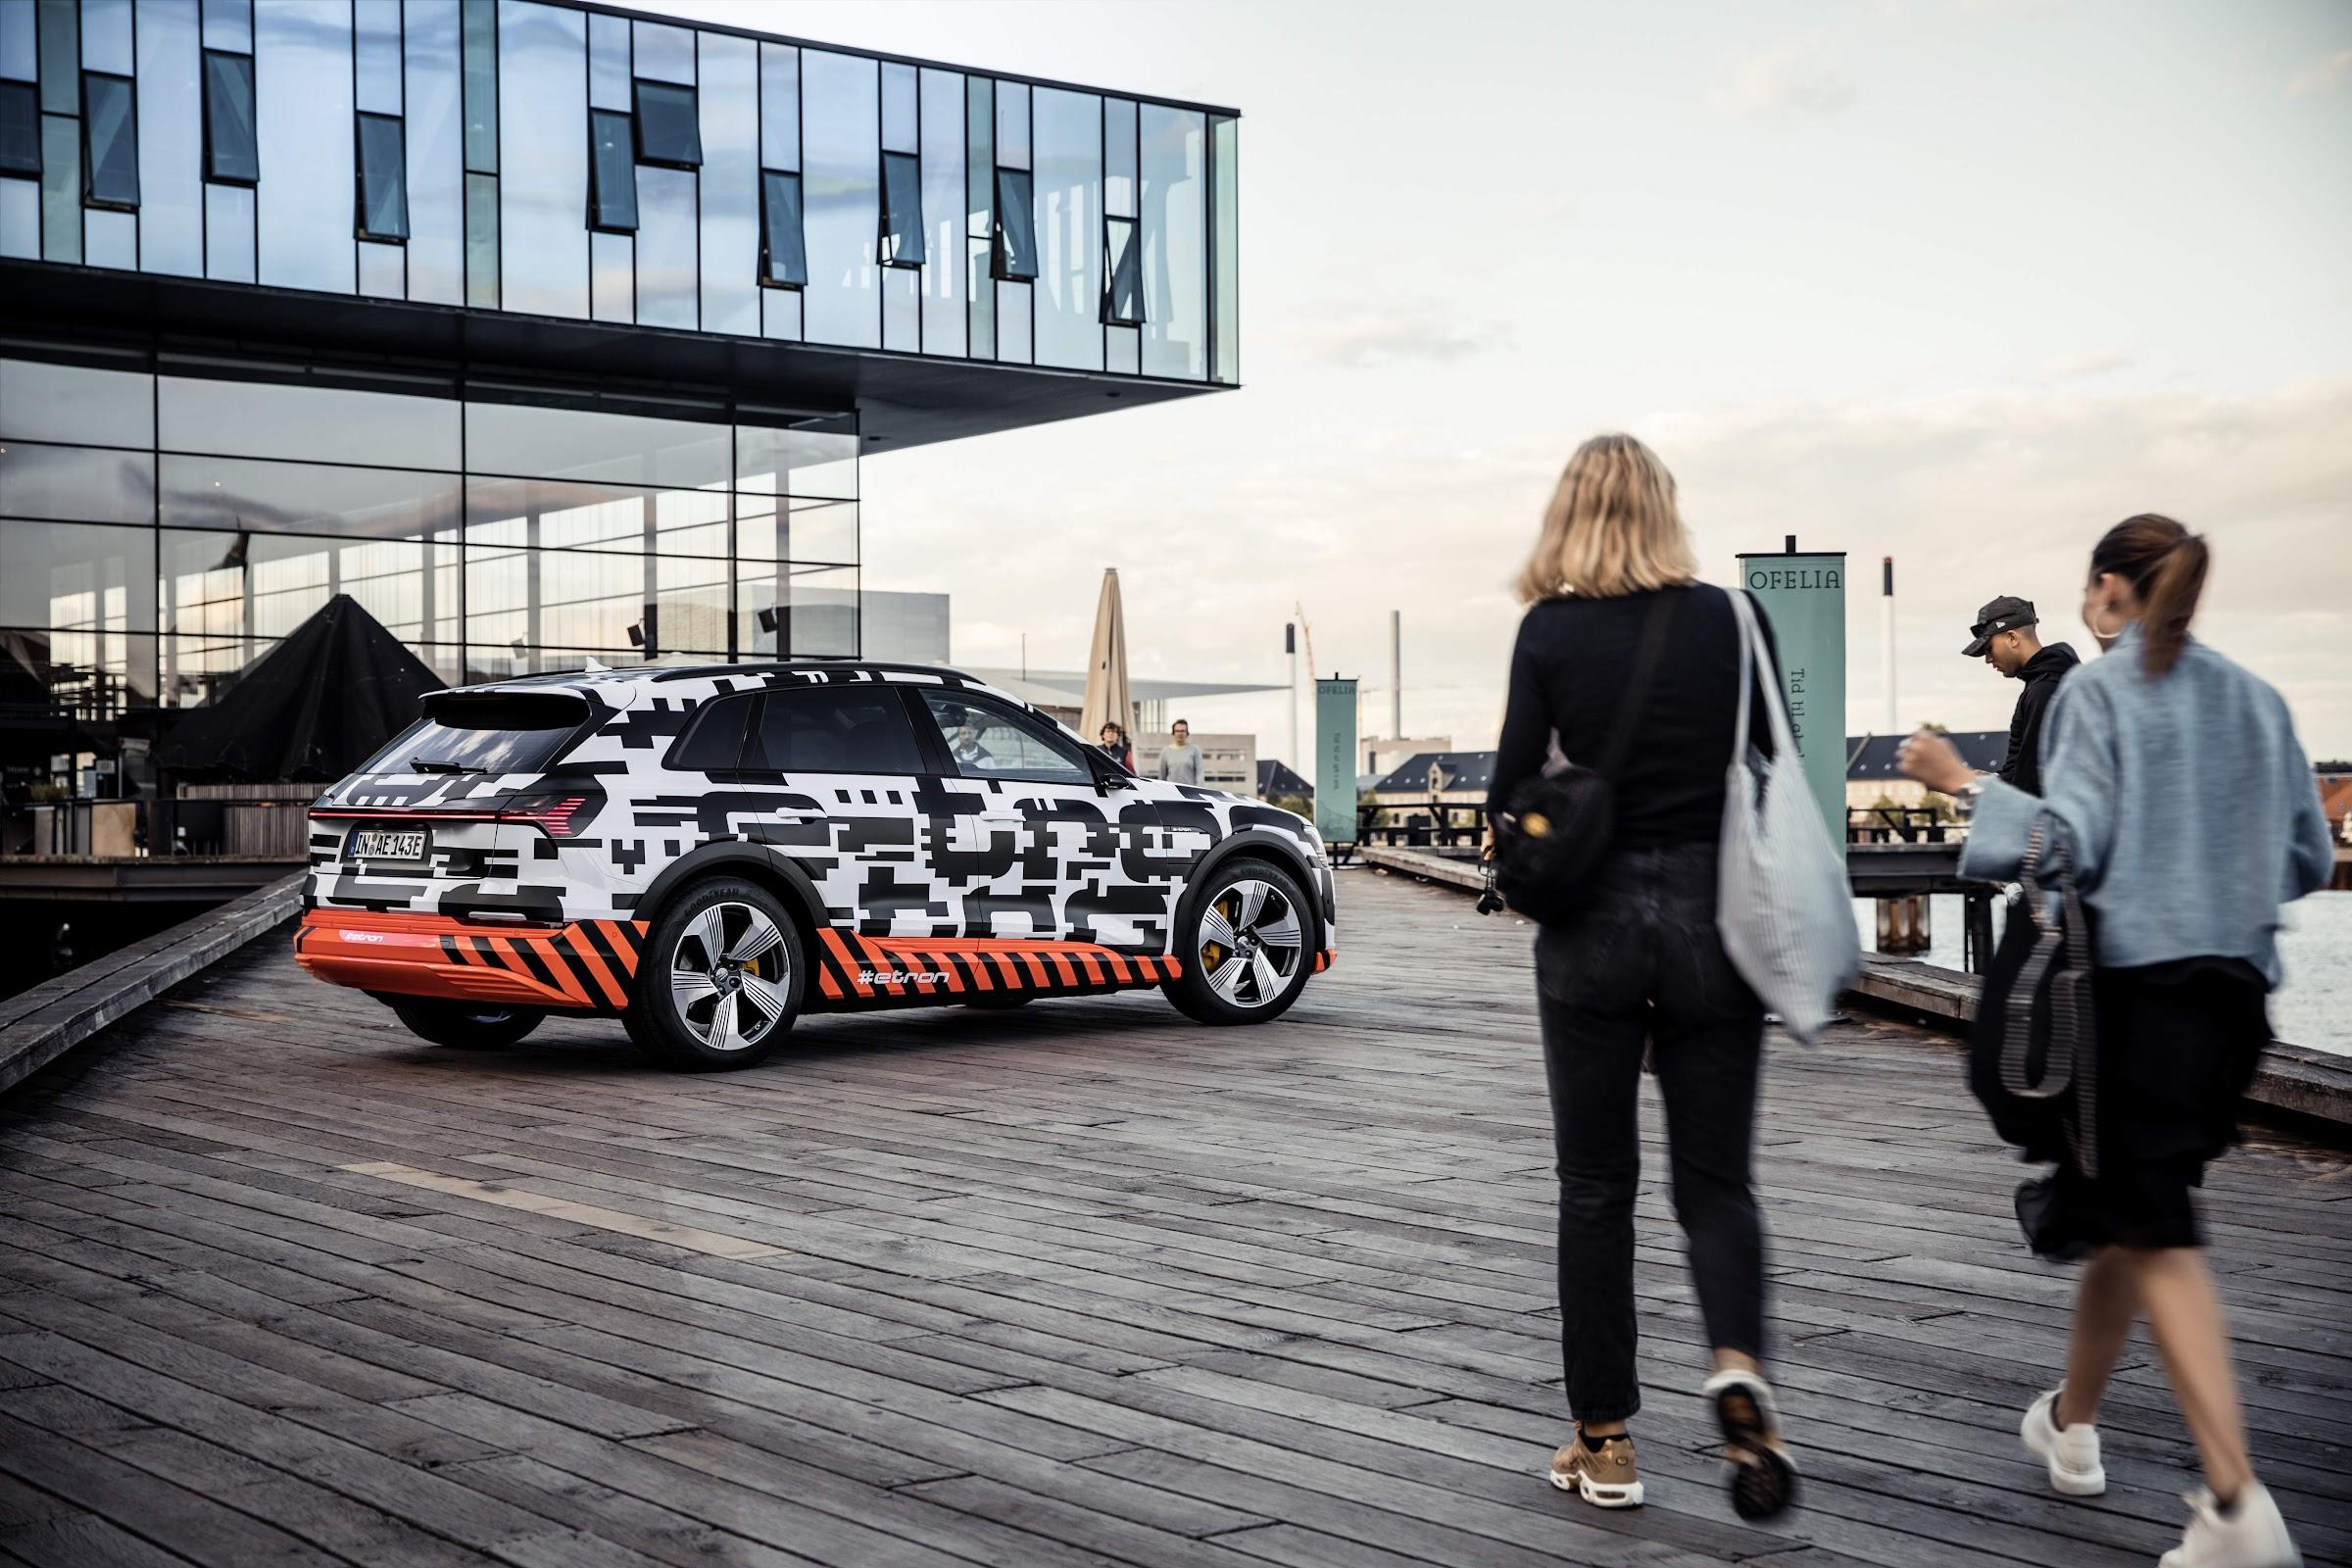 w2VgV8TaYfkpnpnF7ANRqe3xYDM4b7wpbzXONiKn4iQqqDrdukquZdZqkq3MjG2blhGzlSDxVVfeSe3KXhPaj6mxqIvDjqLyhQR2VjIr Tv5xteUb5JdzReq0KO zWcroAVxCJH9dg=w2400 - Así es el interior del Audi e-tron quattro, pantallas por retrovisores